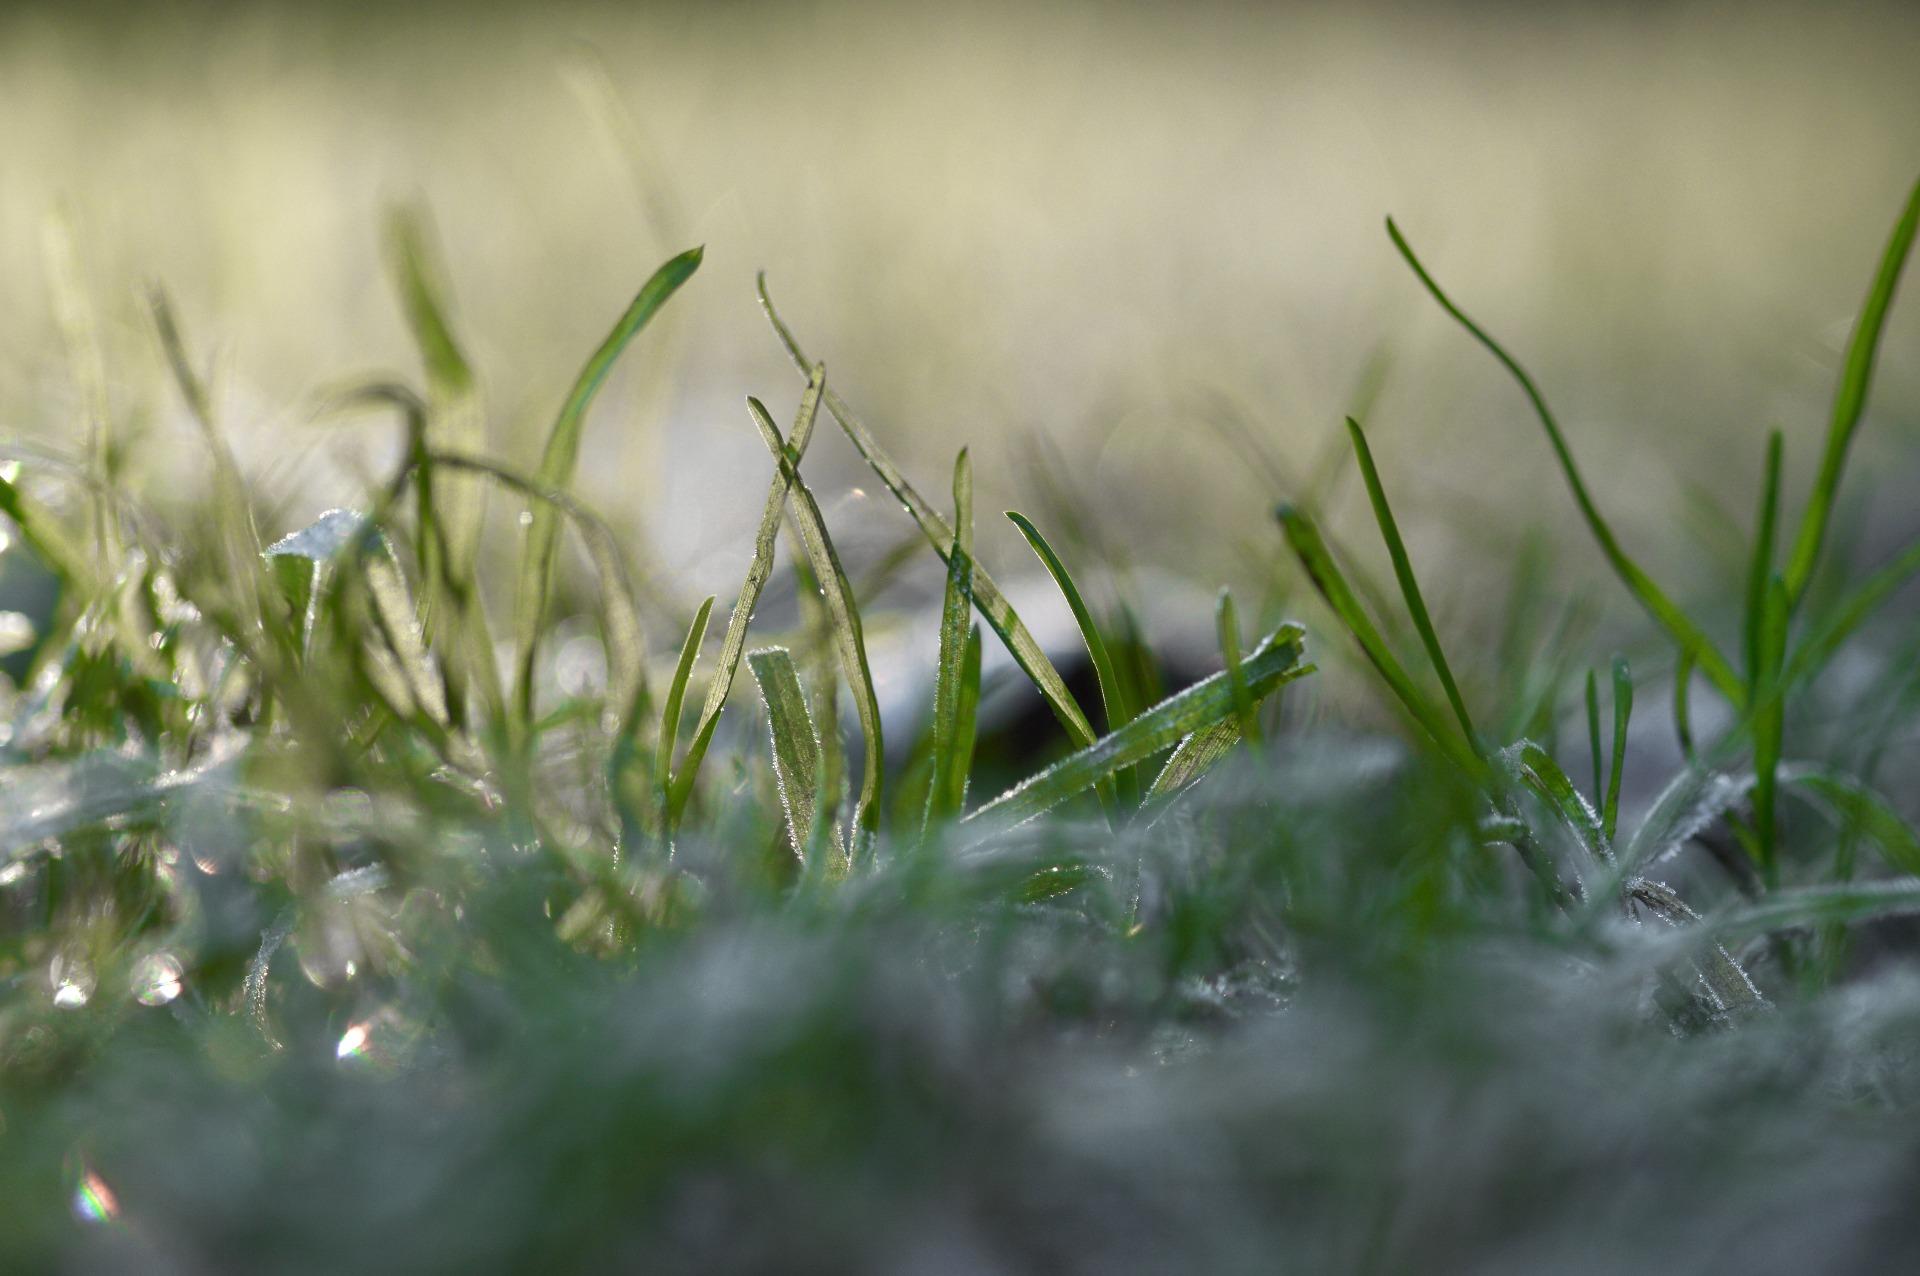 Sprinkler System Winterization Services | CJ Outdoor Lighting & Sprinkler Systems